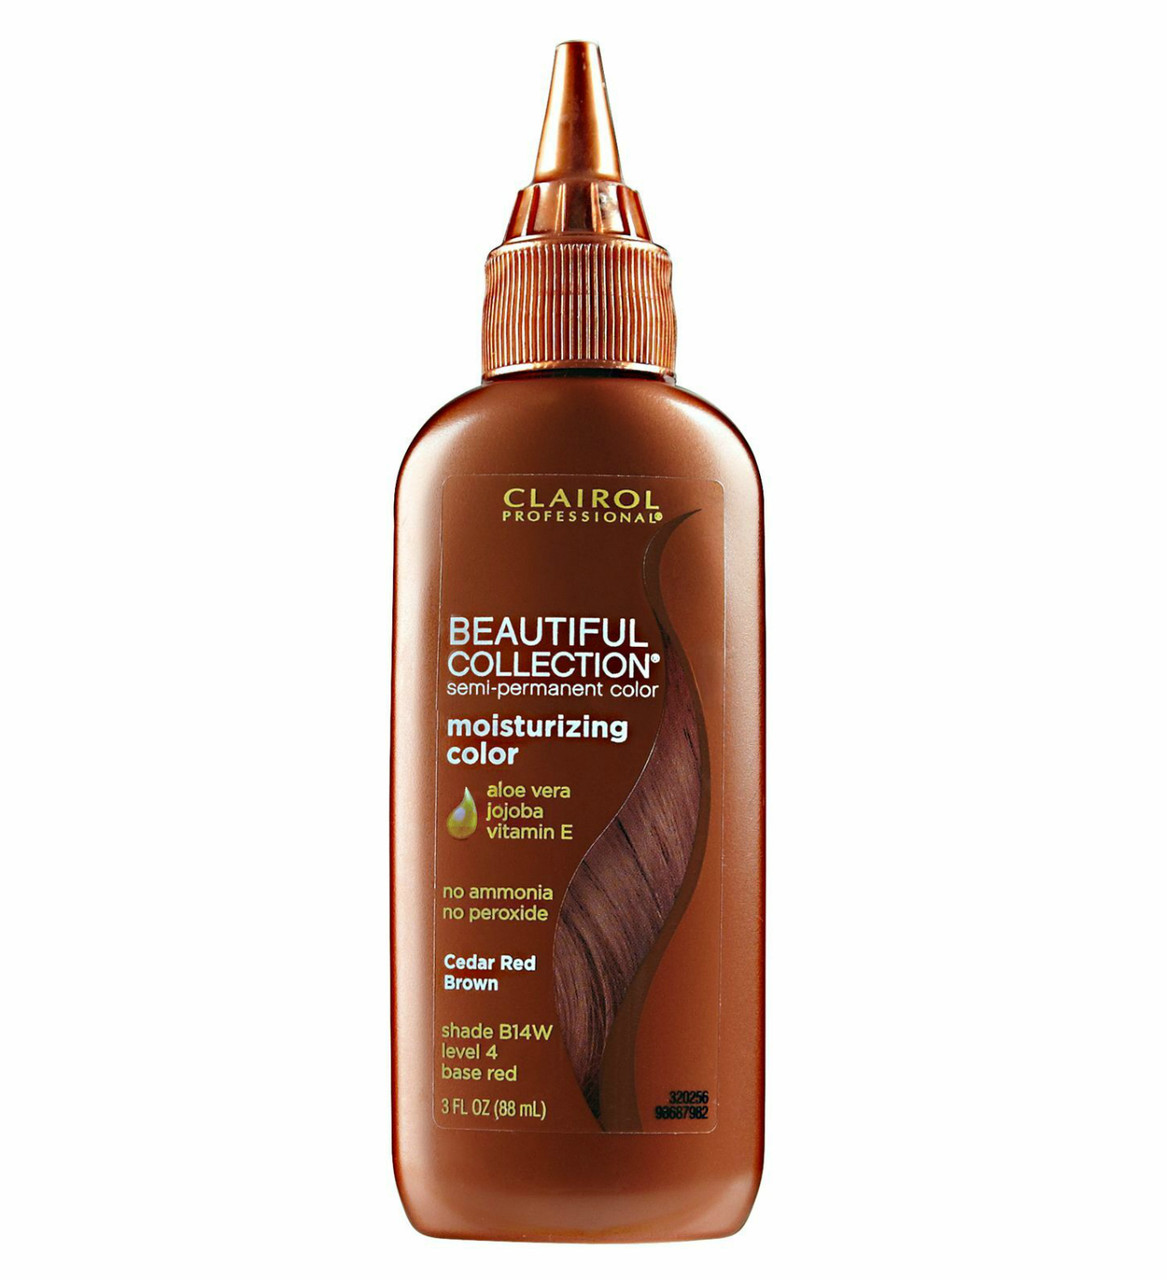 Clairol Beautiful B14W Cedar-Red Brown Hair Color 3 oz: bottle